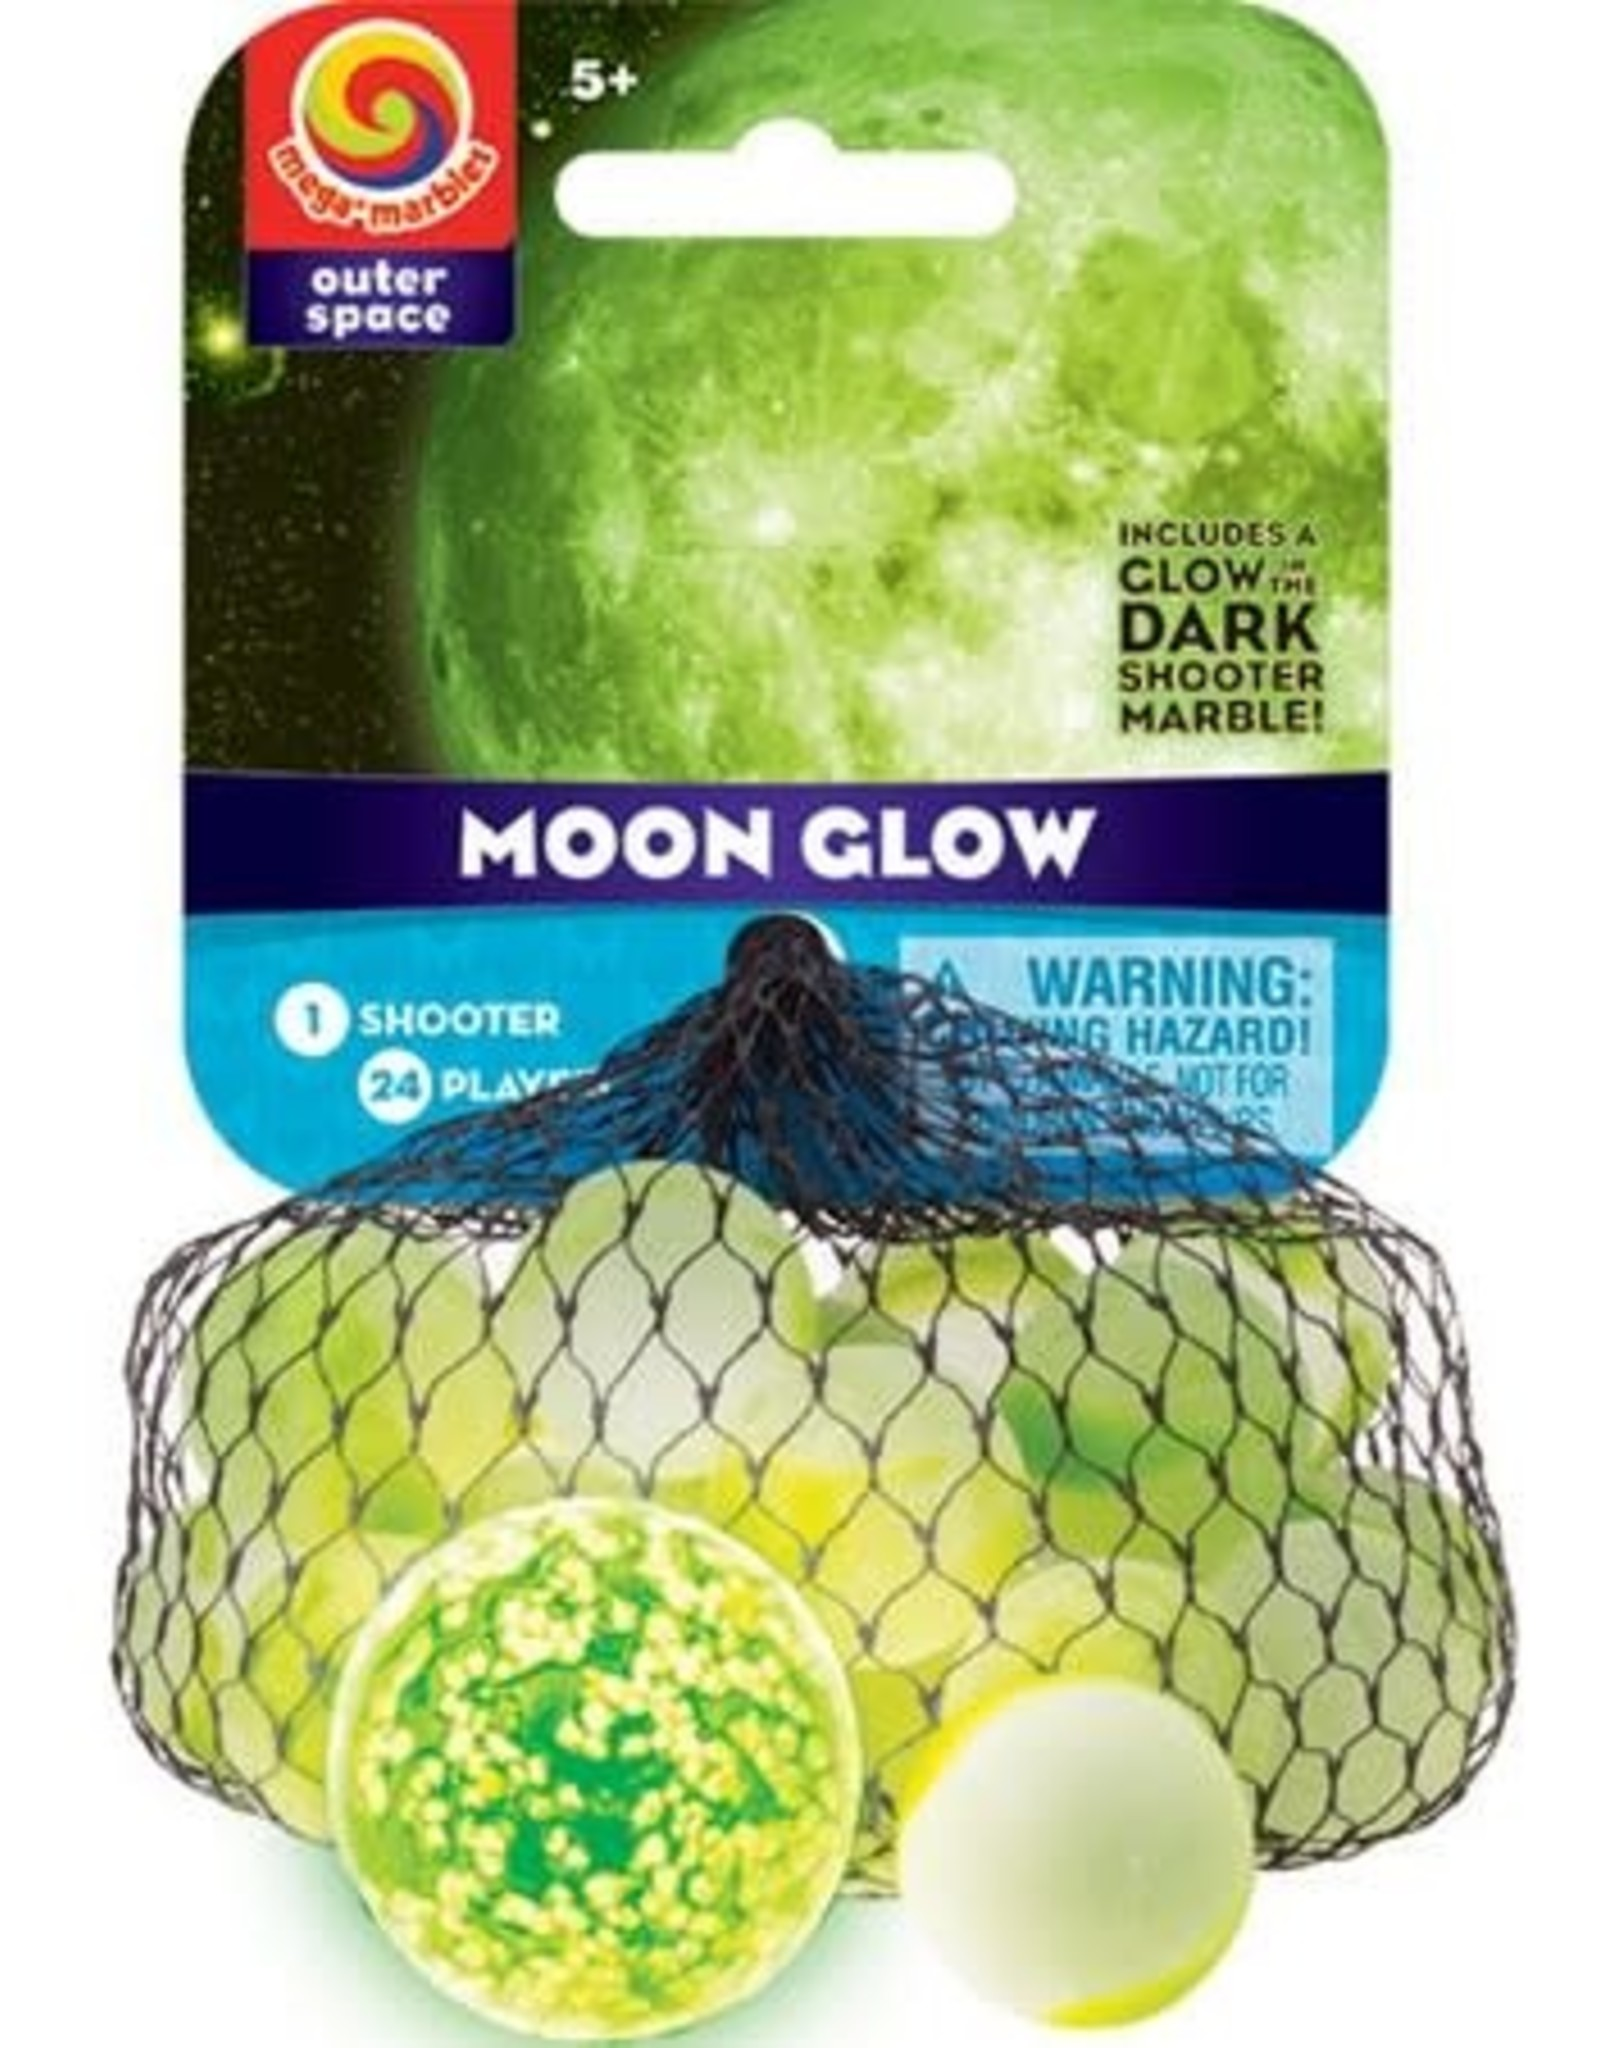 Moon Glow Marbles